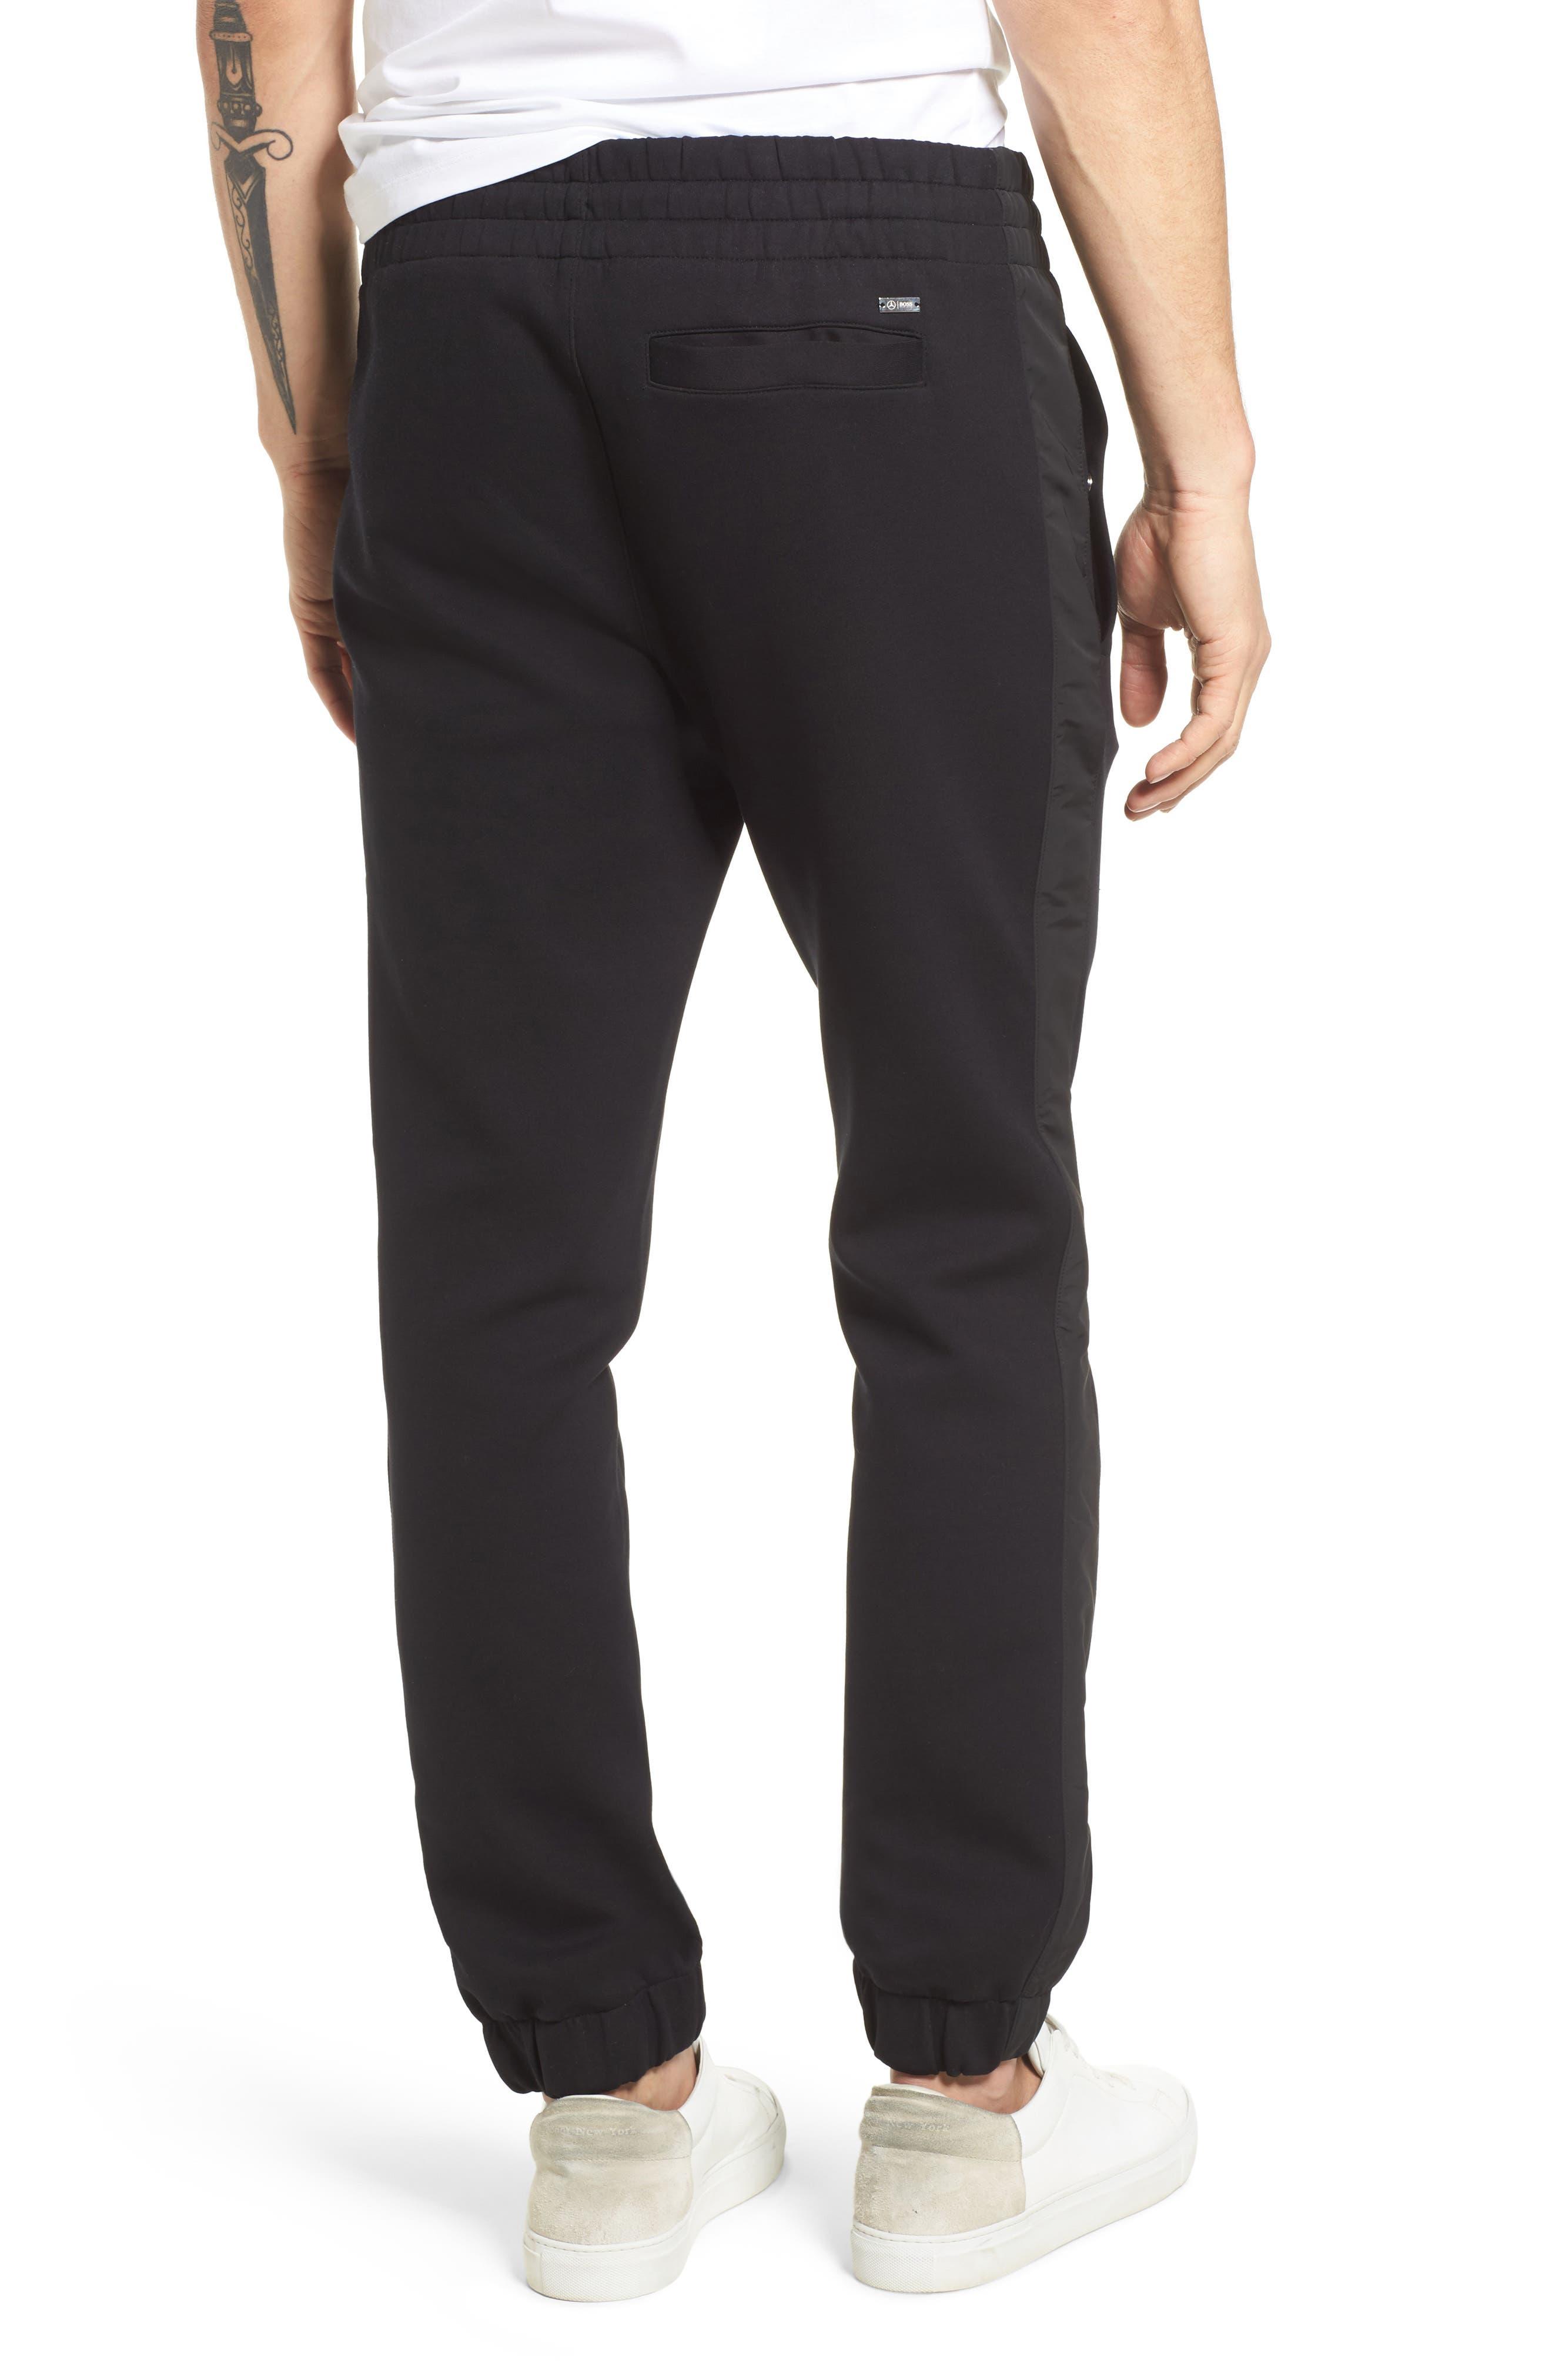 Lamont Mercedes Jogger Pants,                             Alternate thumbnail 2, color,                             Black